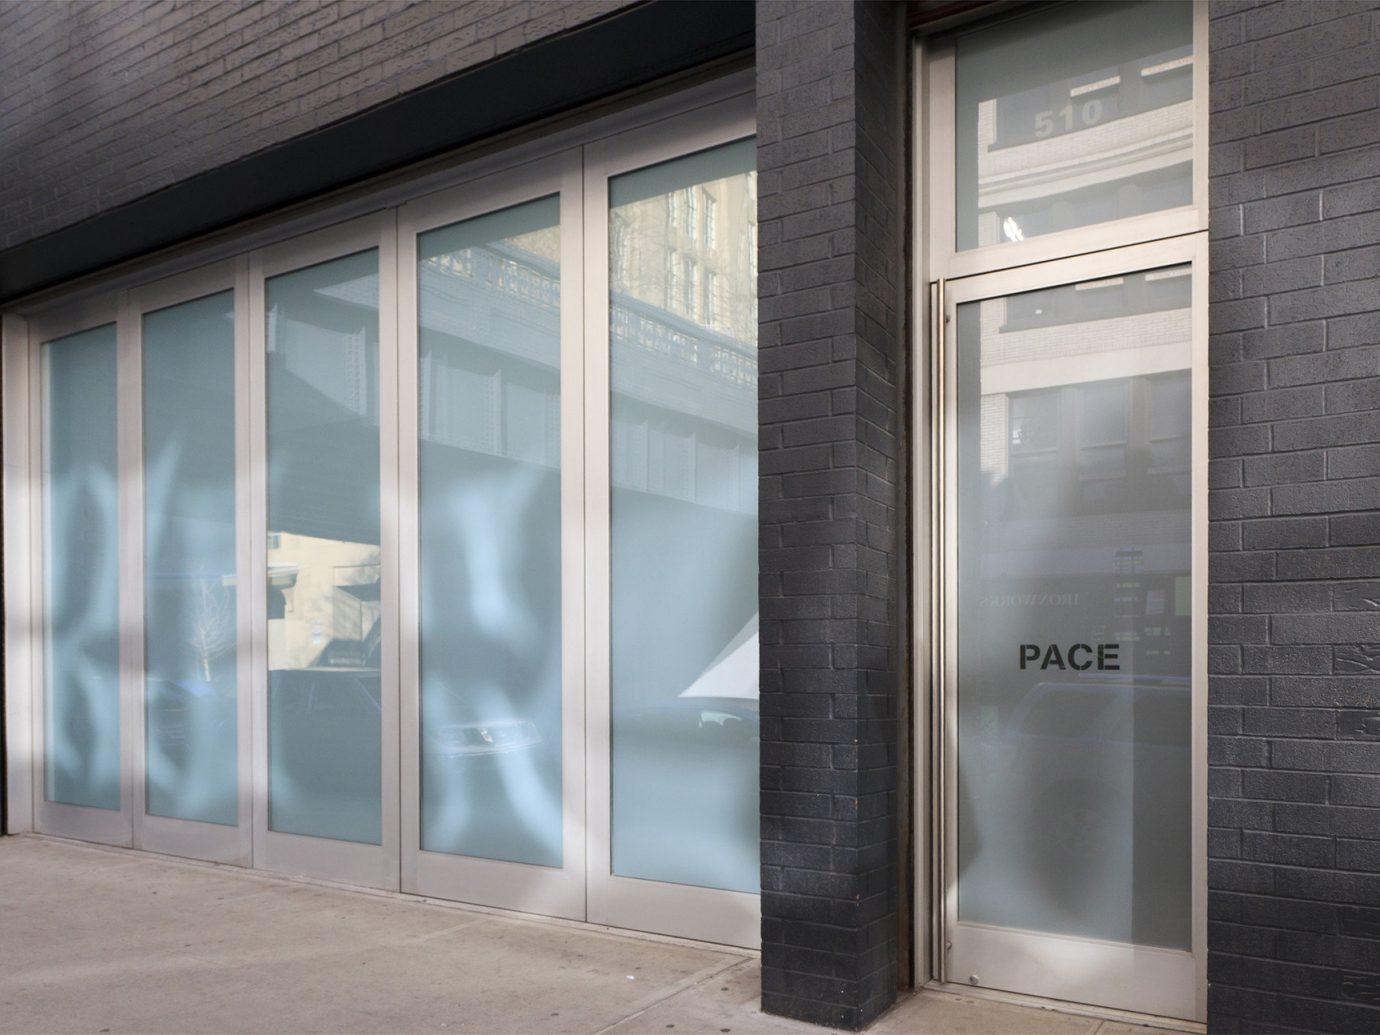 Budget window door wall Architecture interior design facade window covering glass material open empty opened